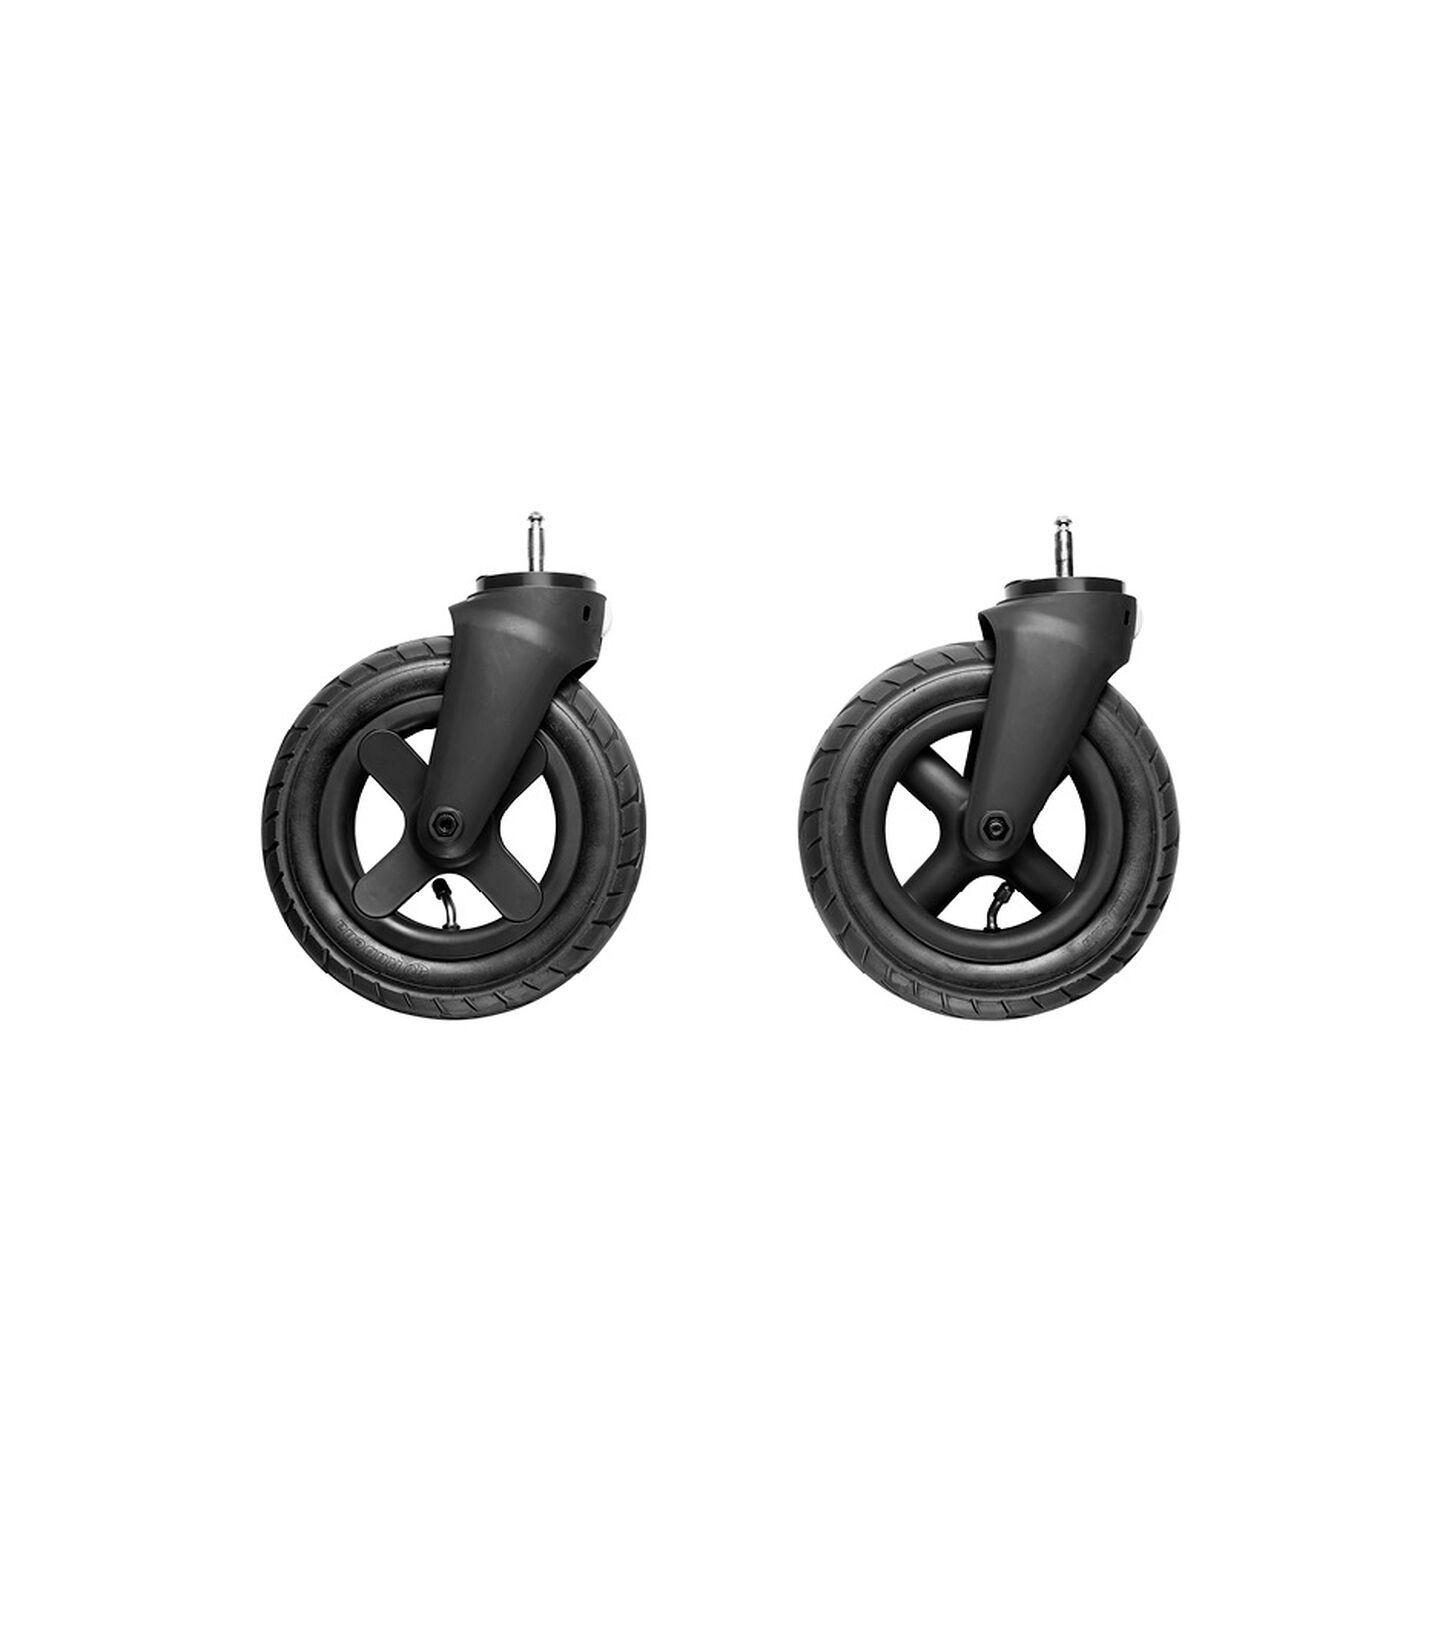 Stokke® Trailz™ Black terrängframhjul (2 st.), , mainview view 2